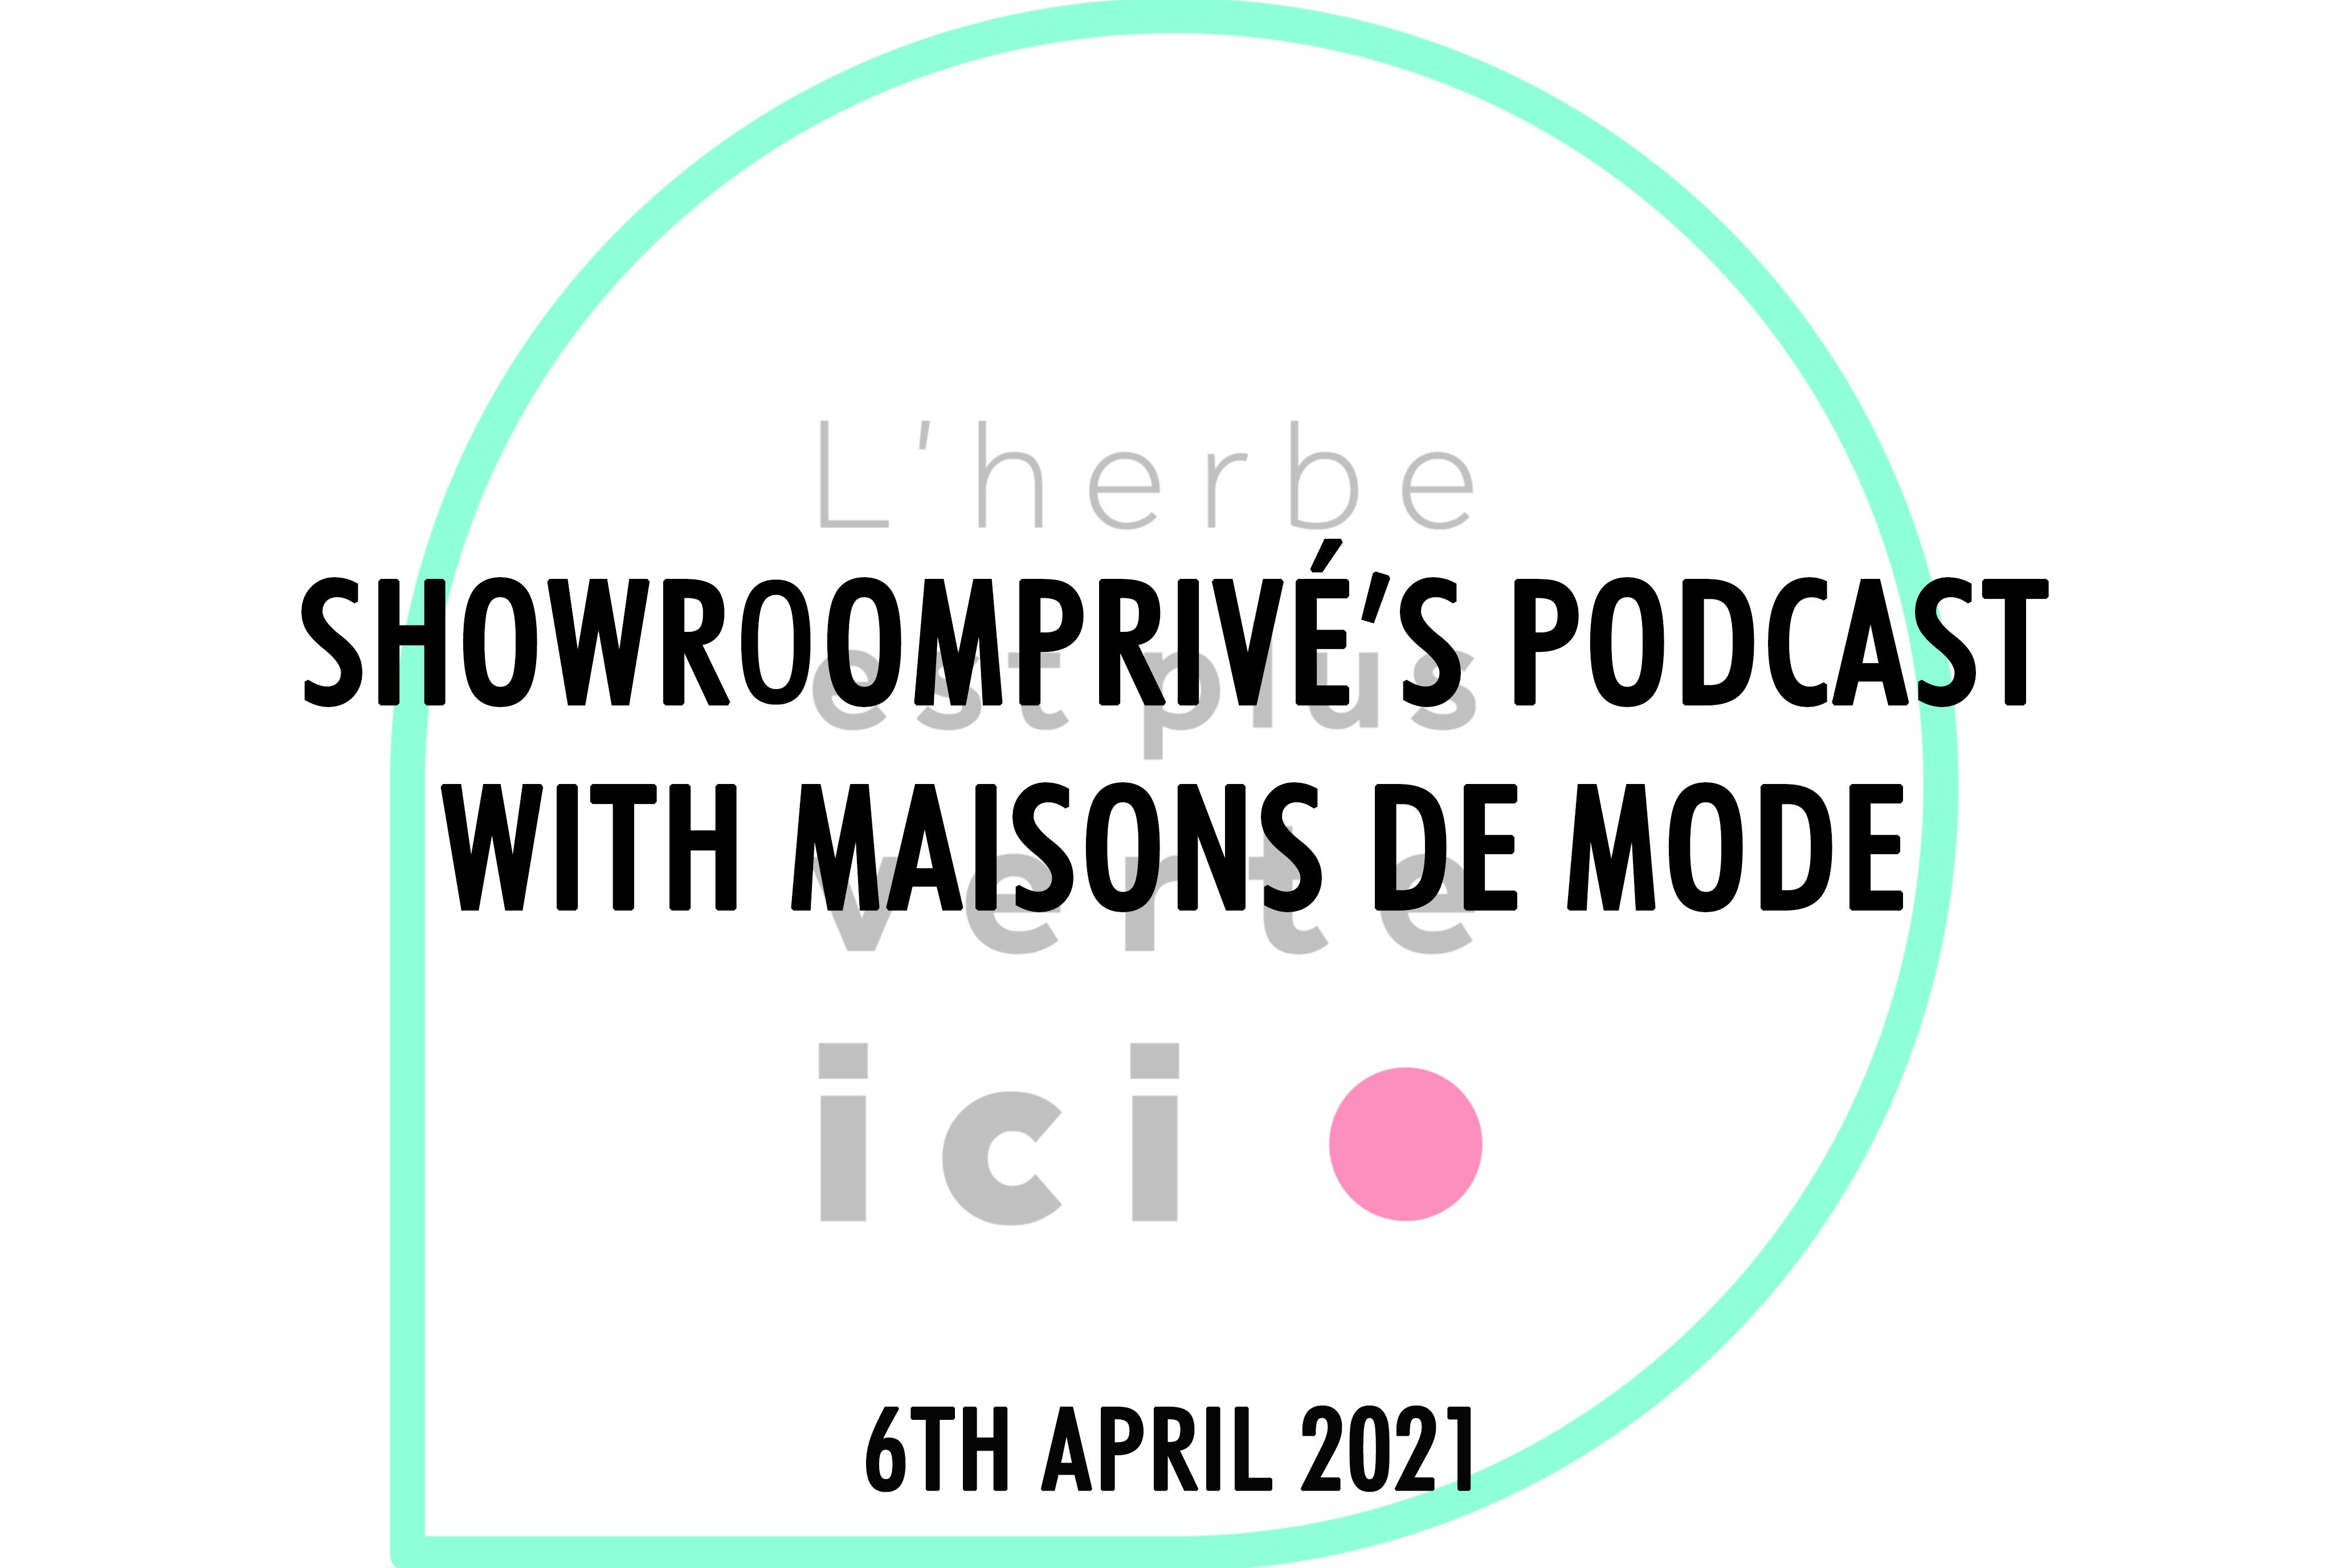 showroomprive-podcast-maisons-de-mode